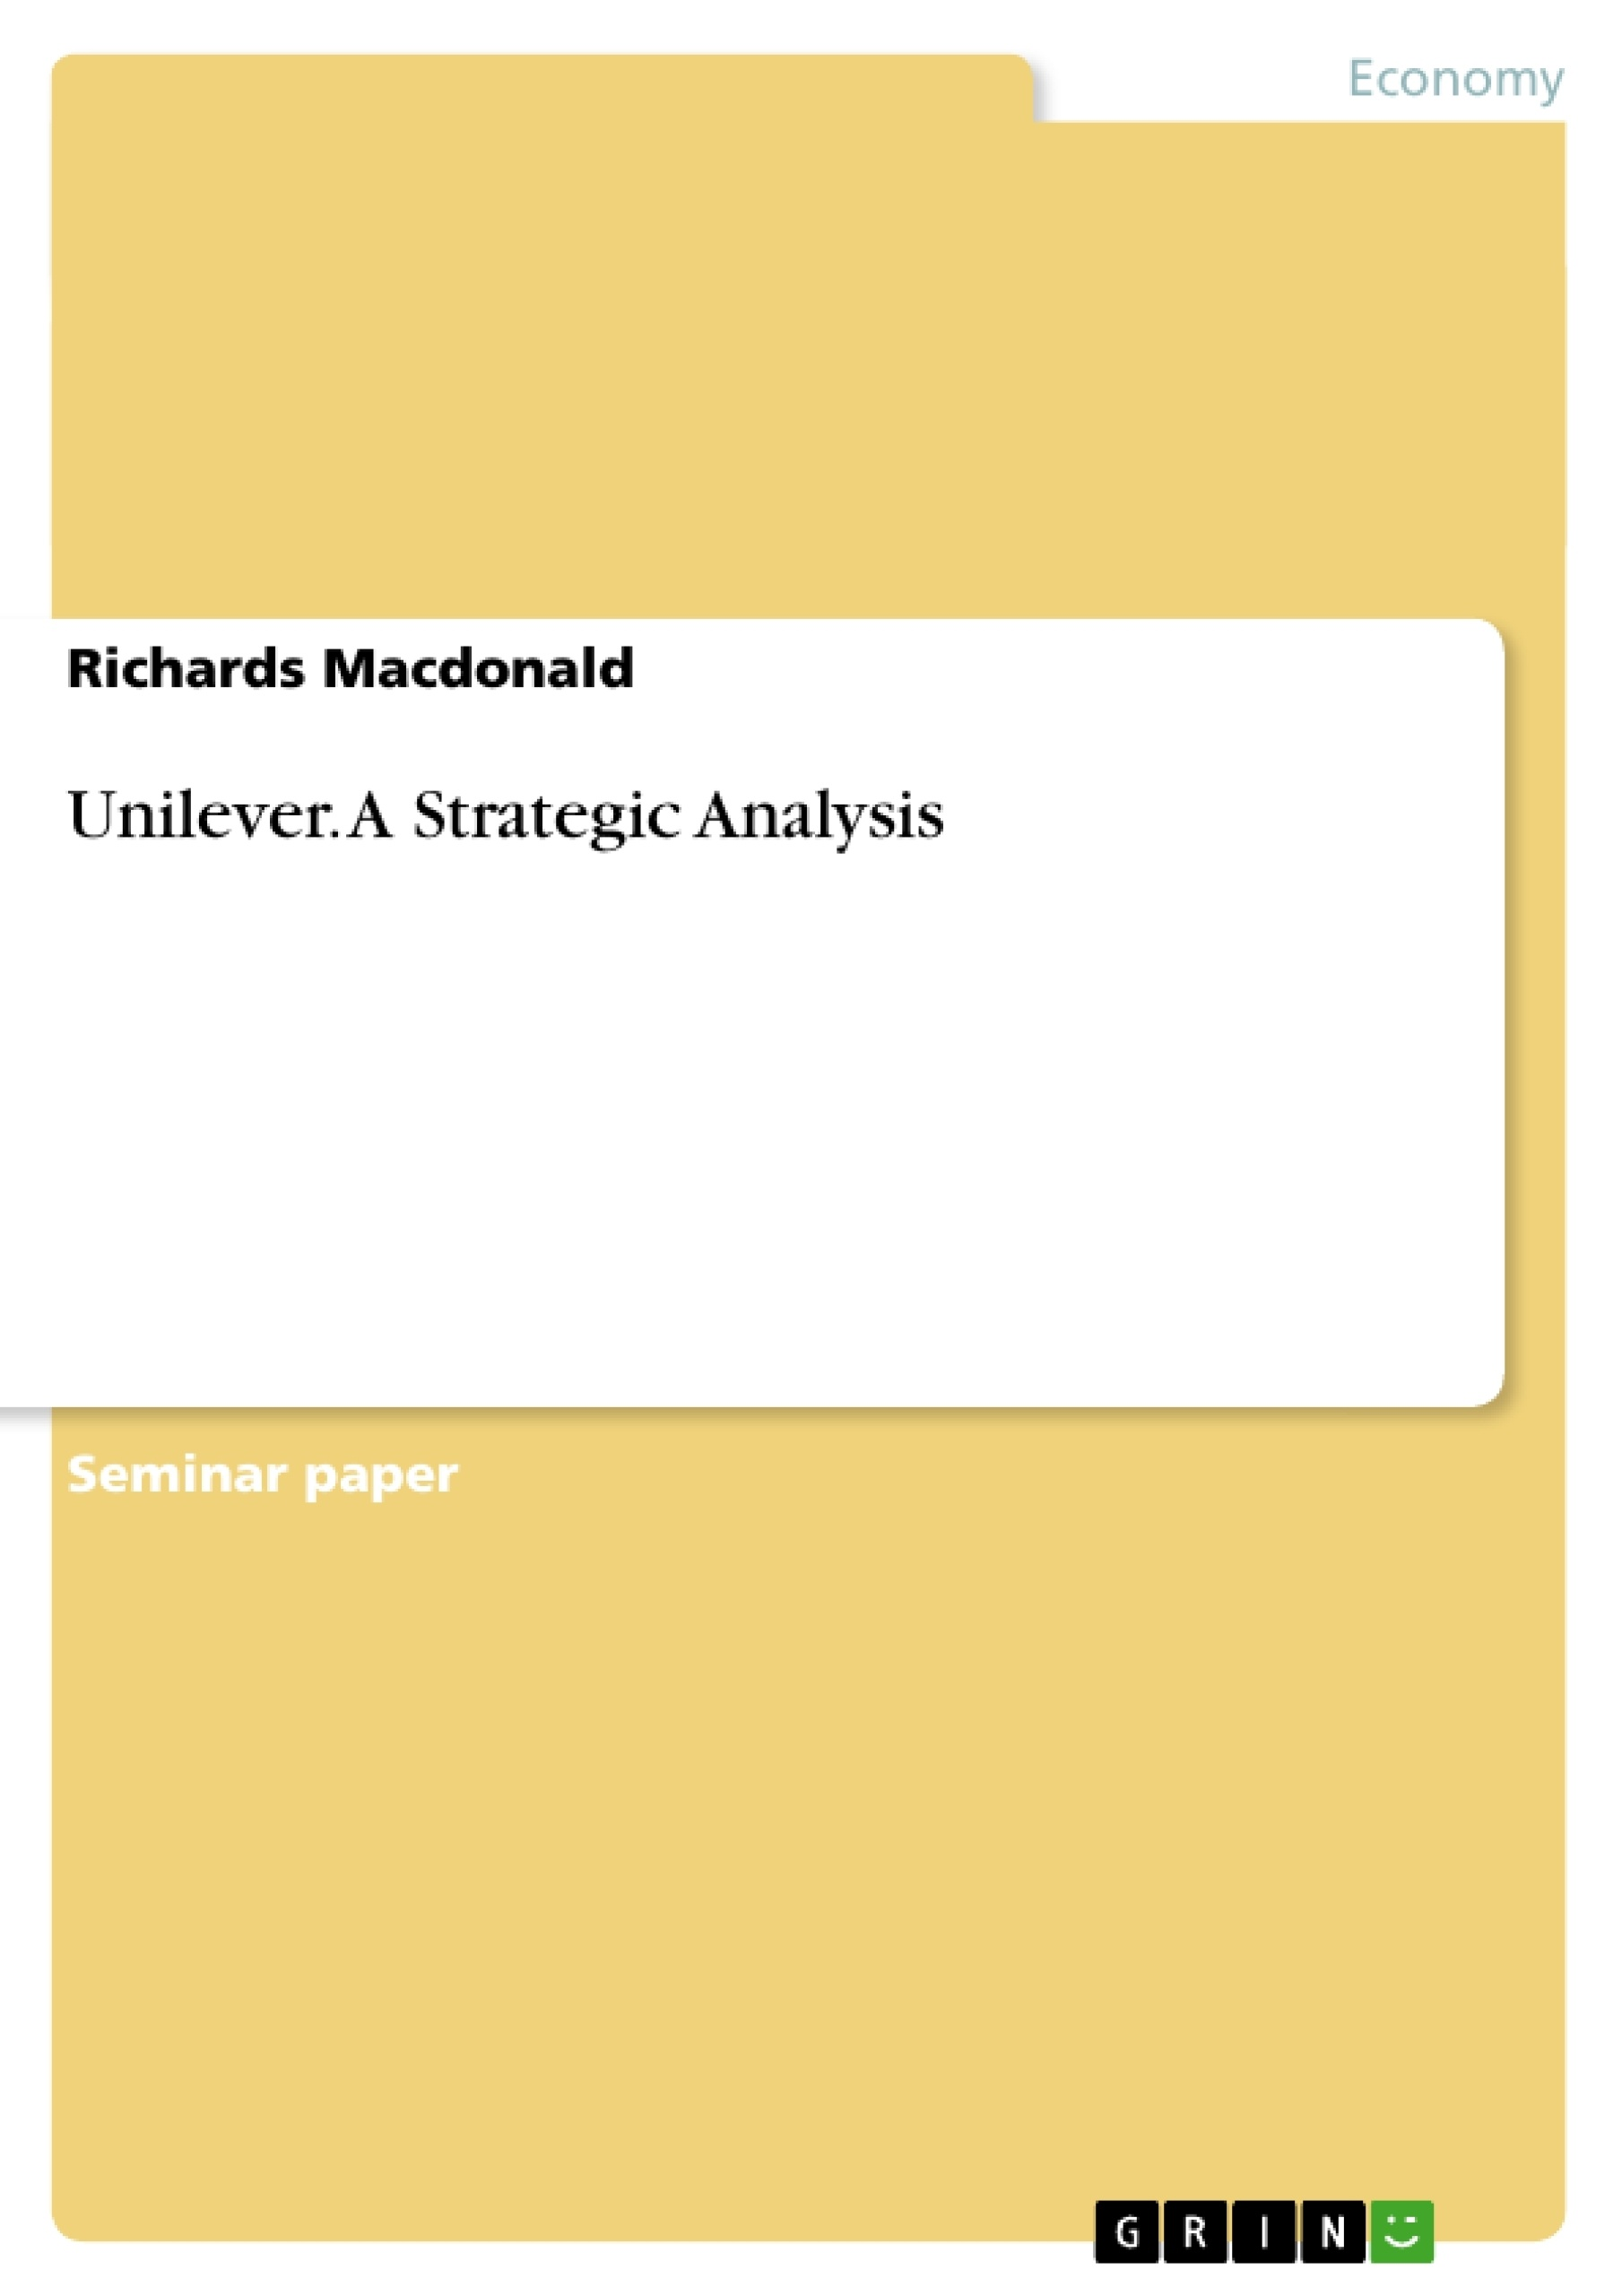 Title: Unilever. A Strategic Analysis